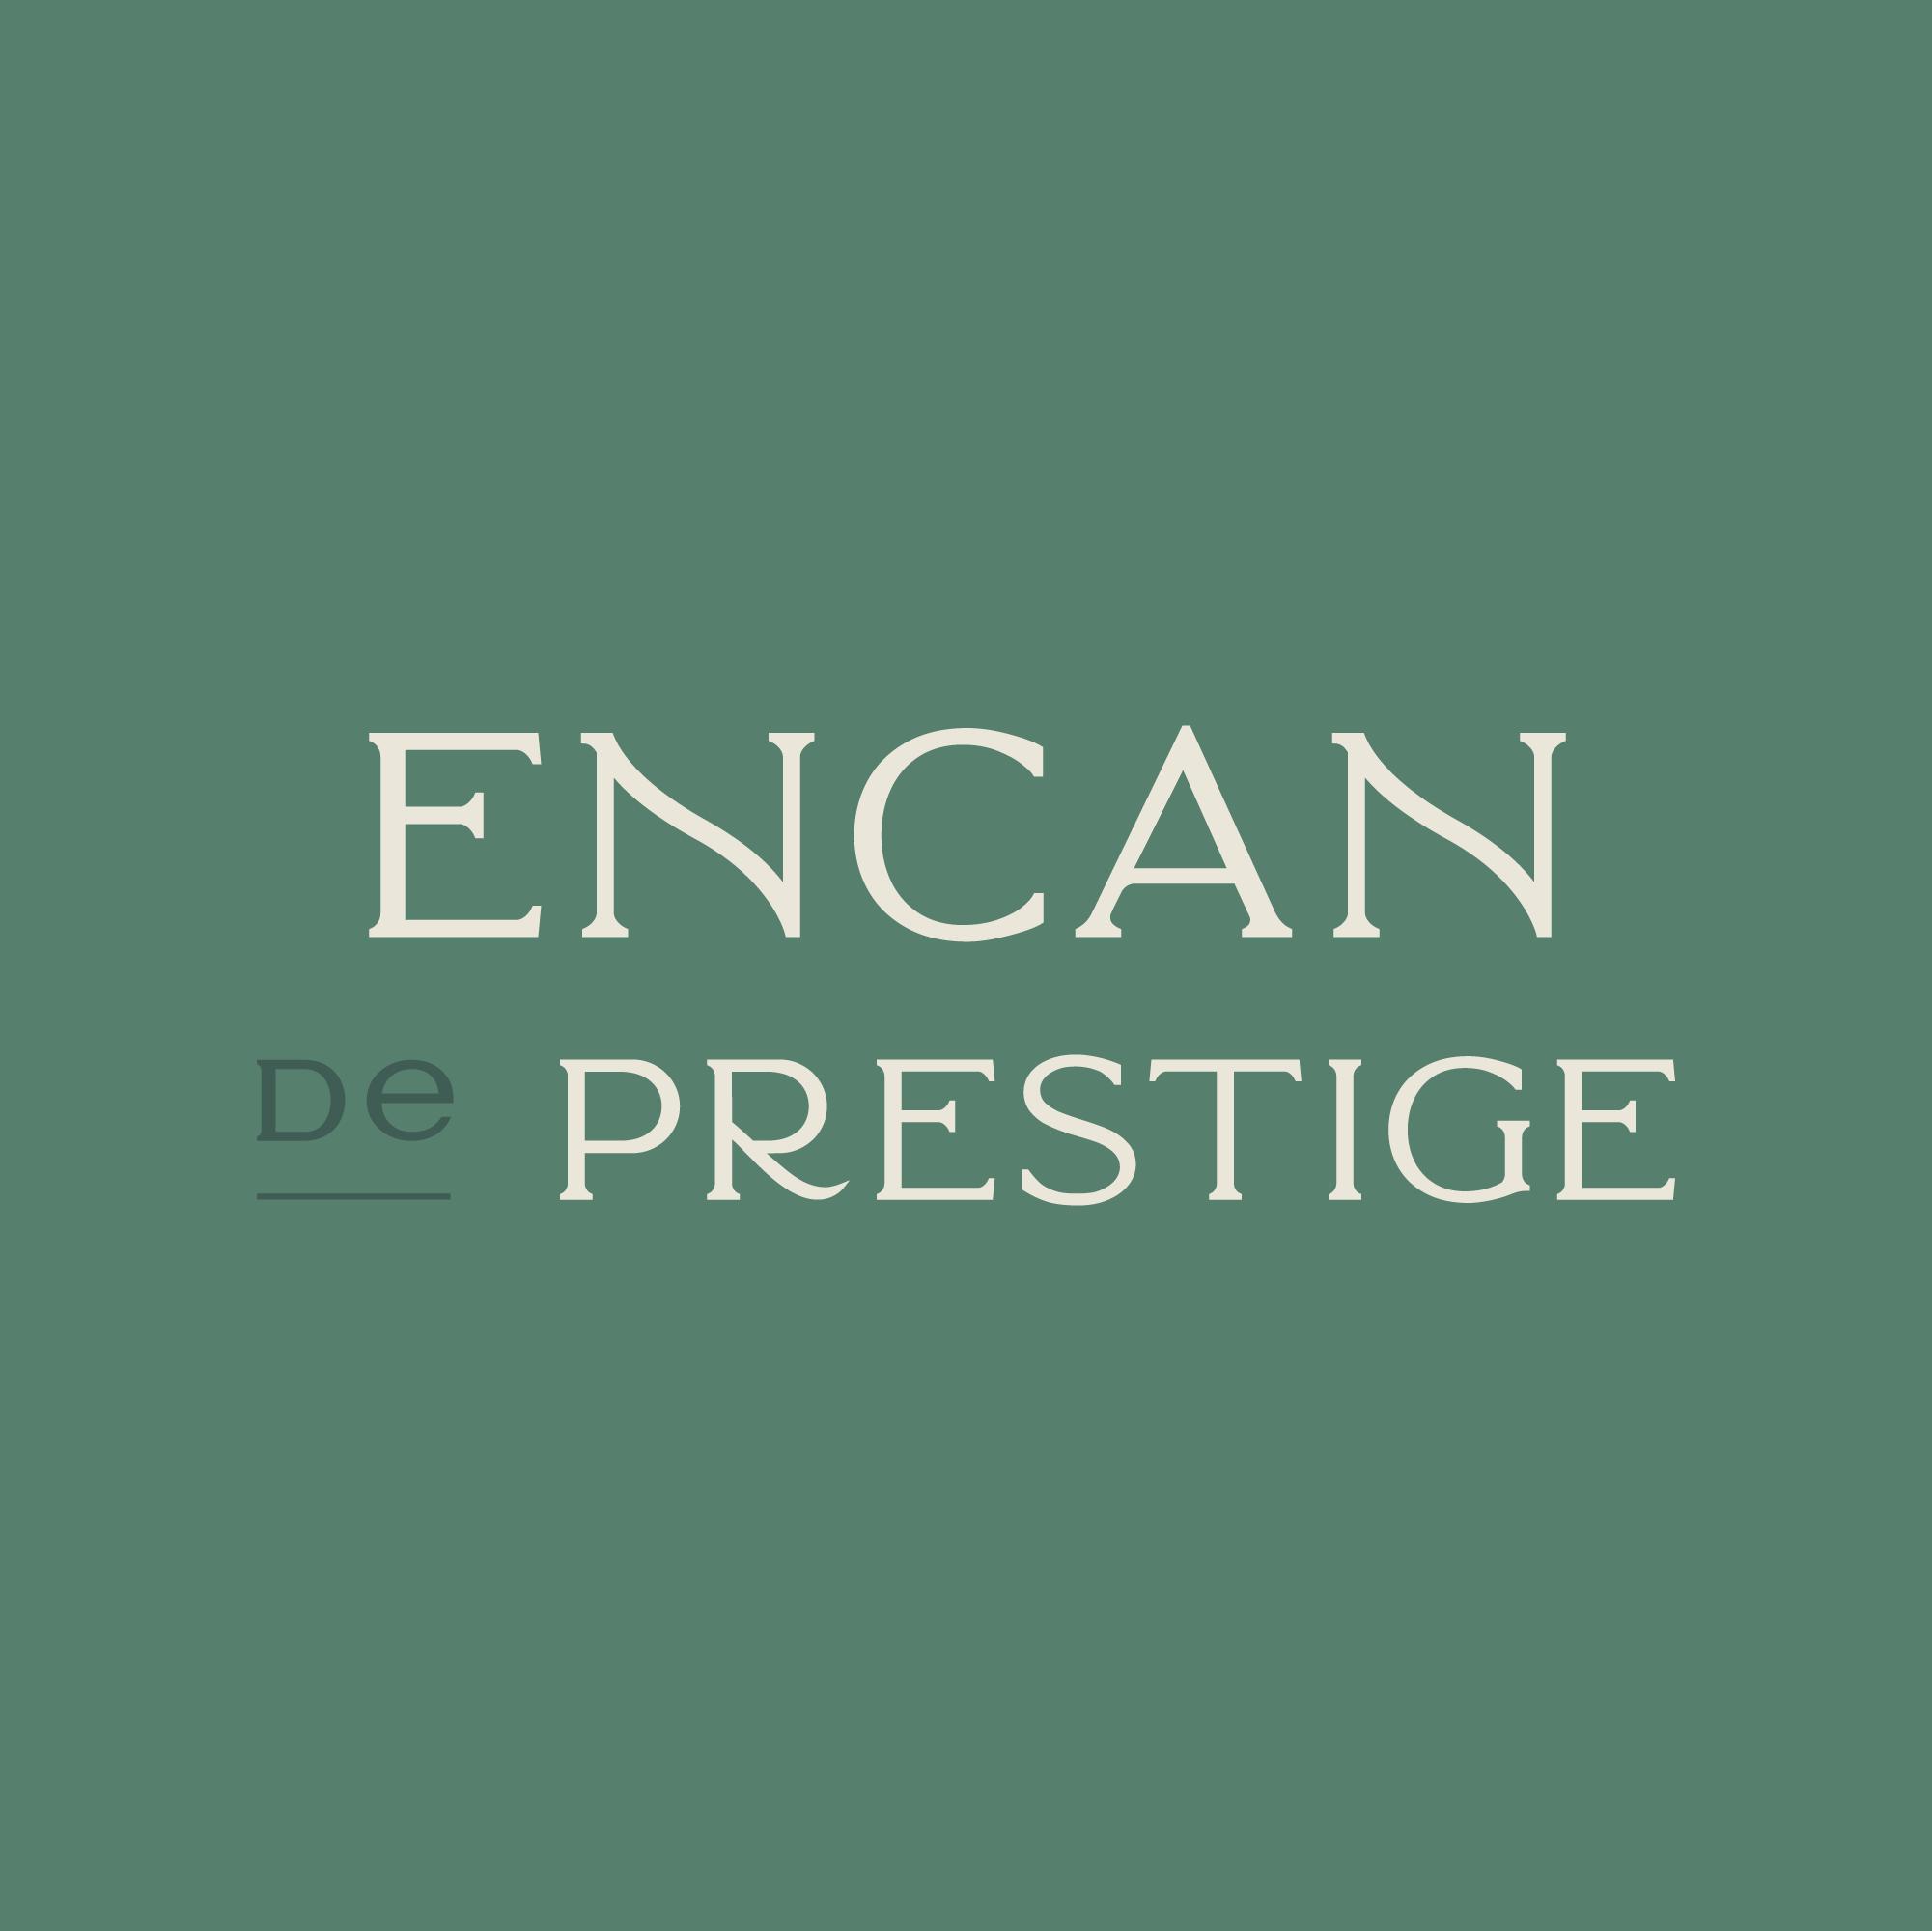 Encan Prestige par Valfeltõ